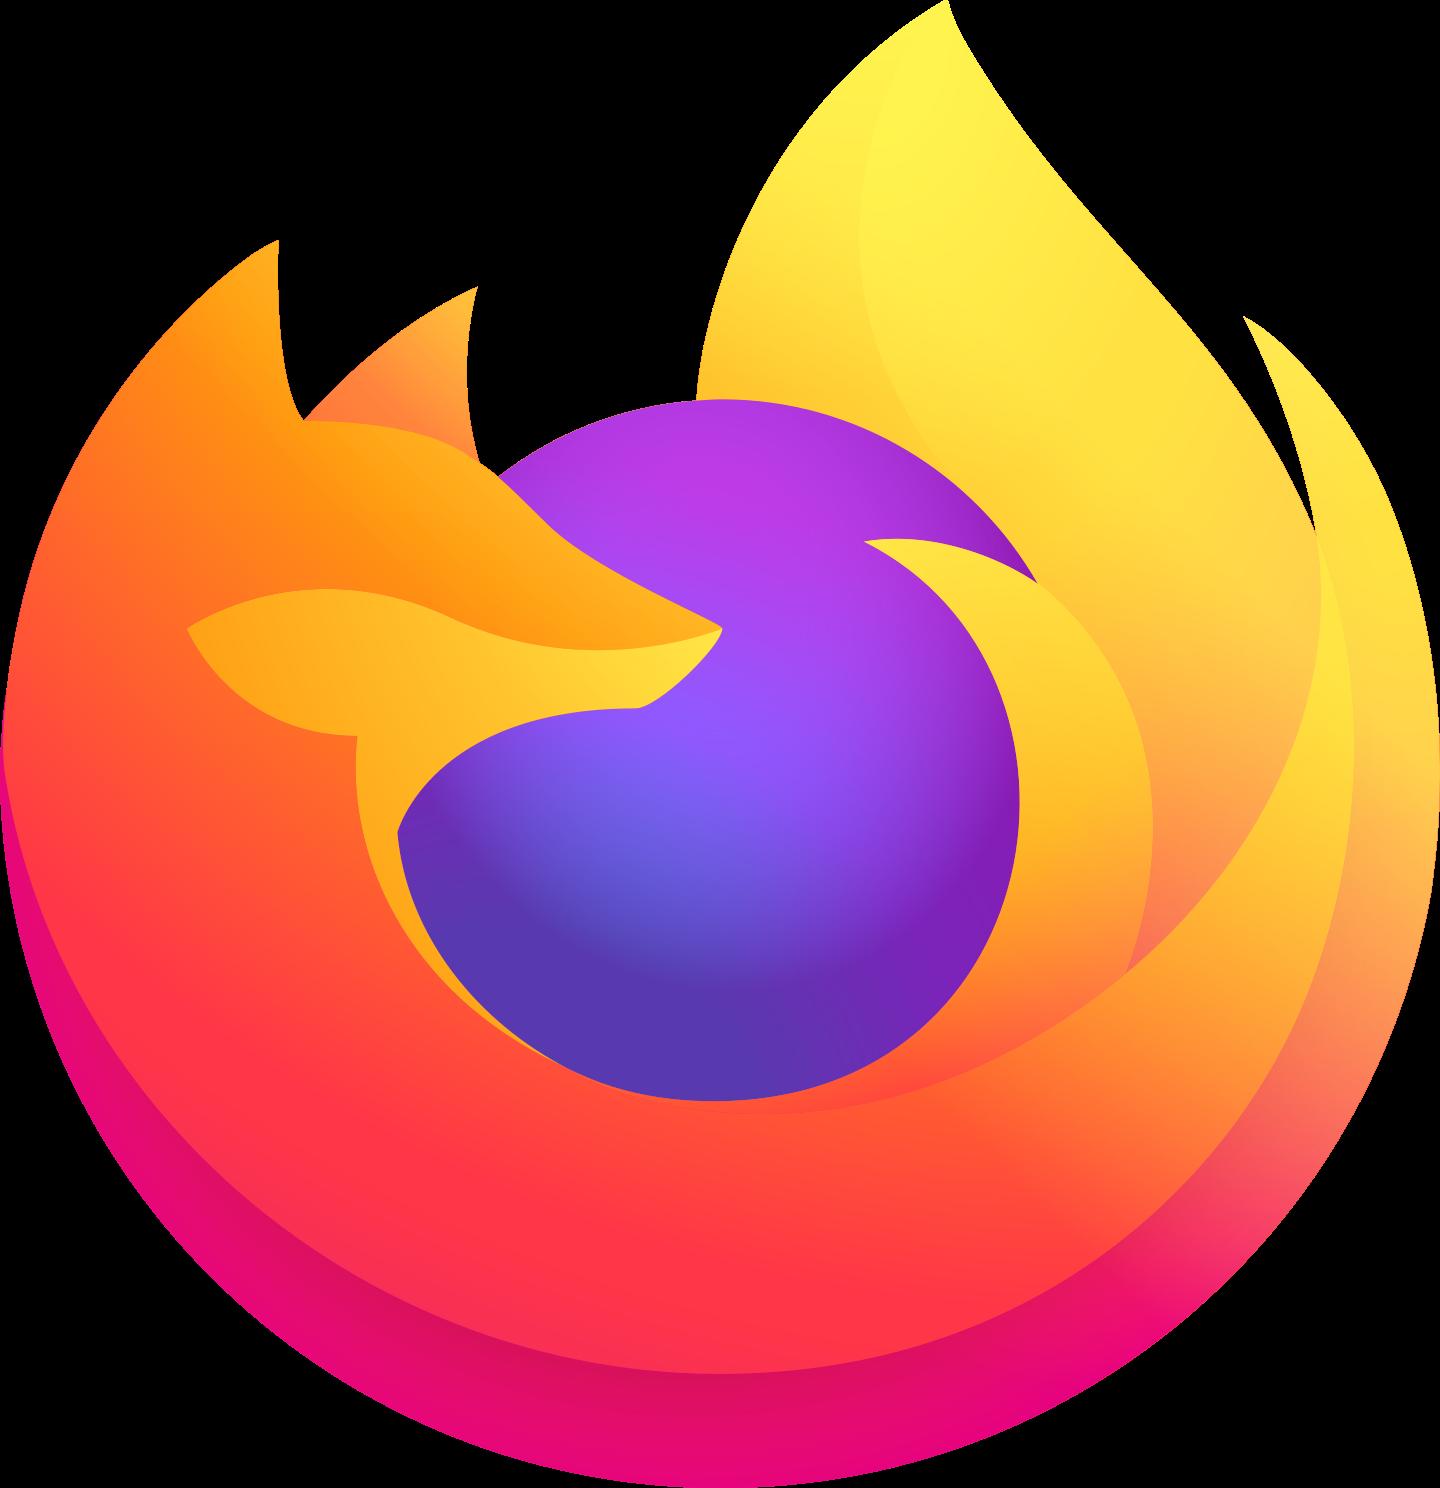 firefox logo 3 - Firefox Logo